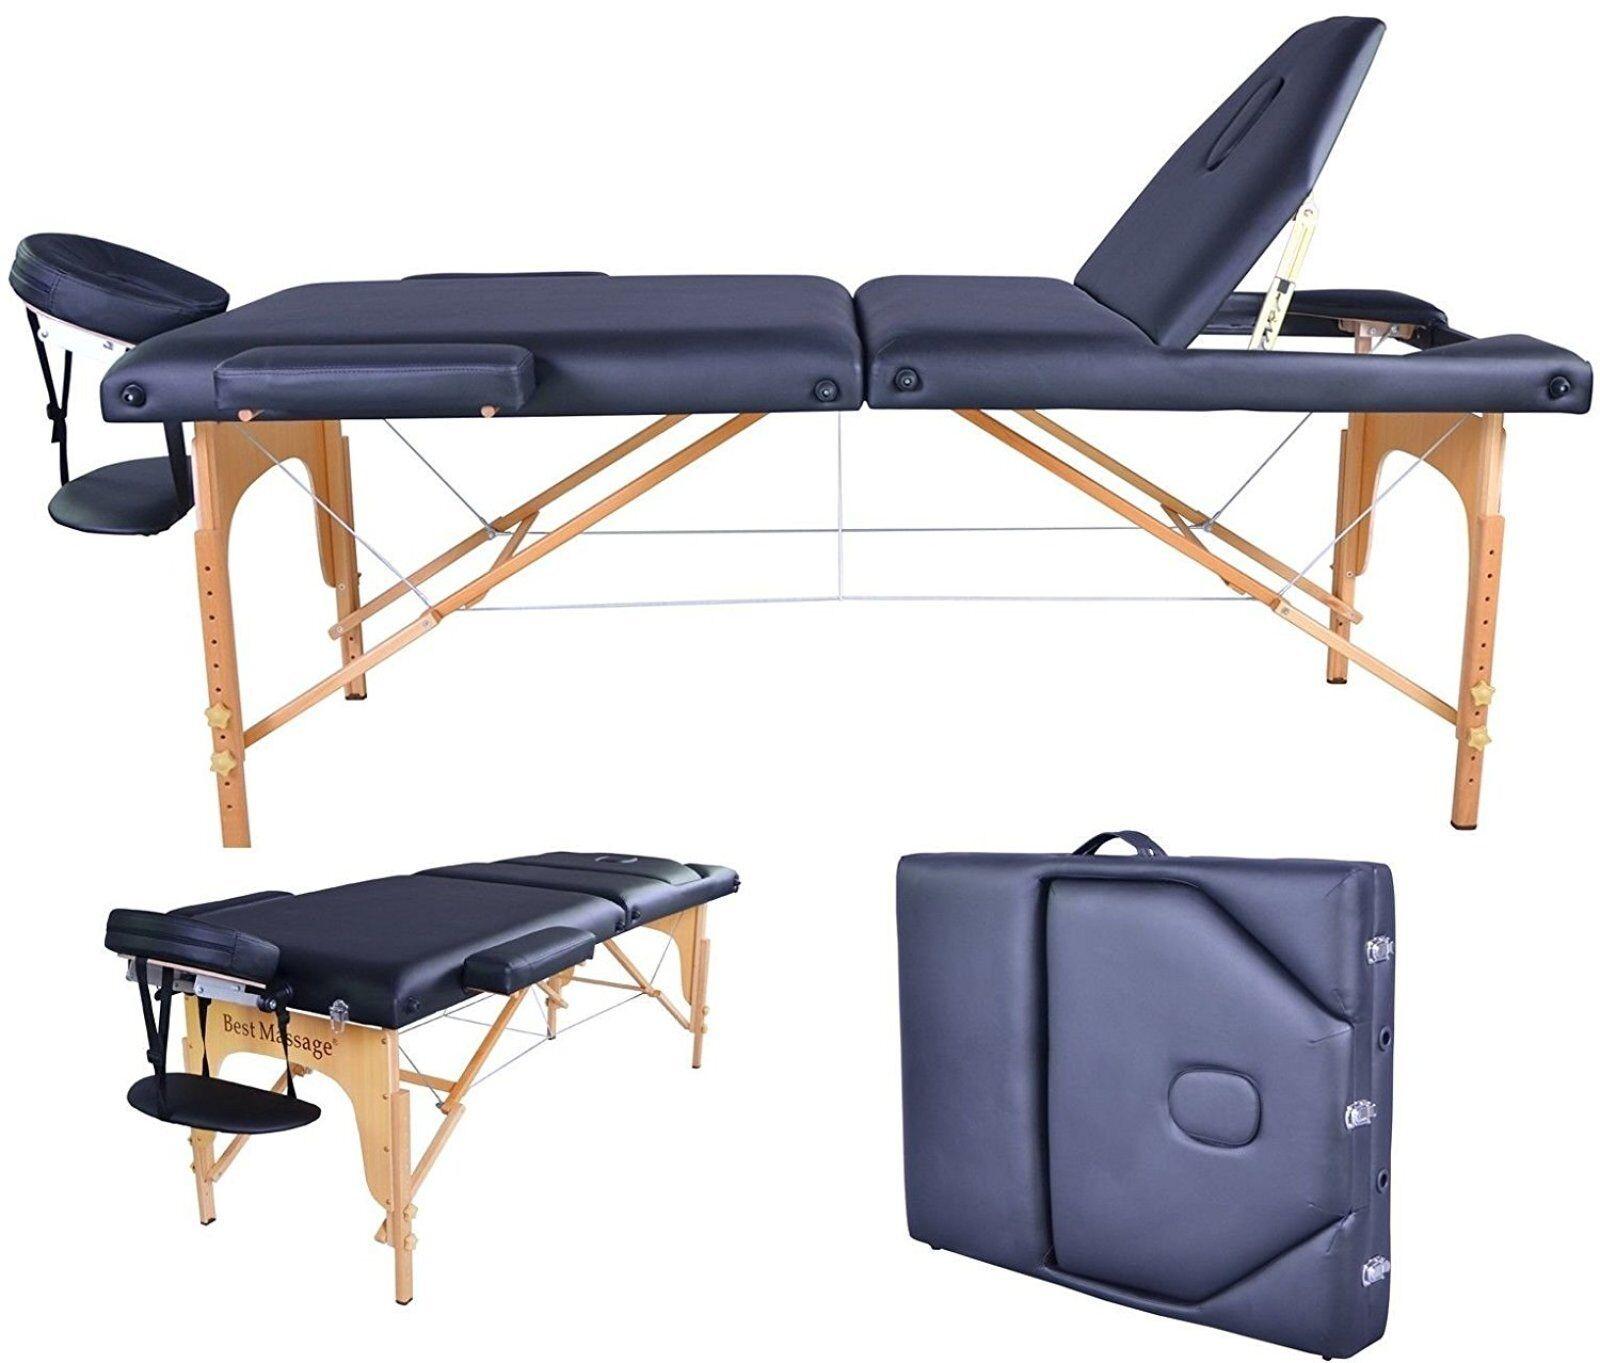 BestMassage Black Reiki Portable Massage Table, have the sam